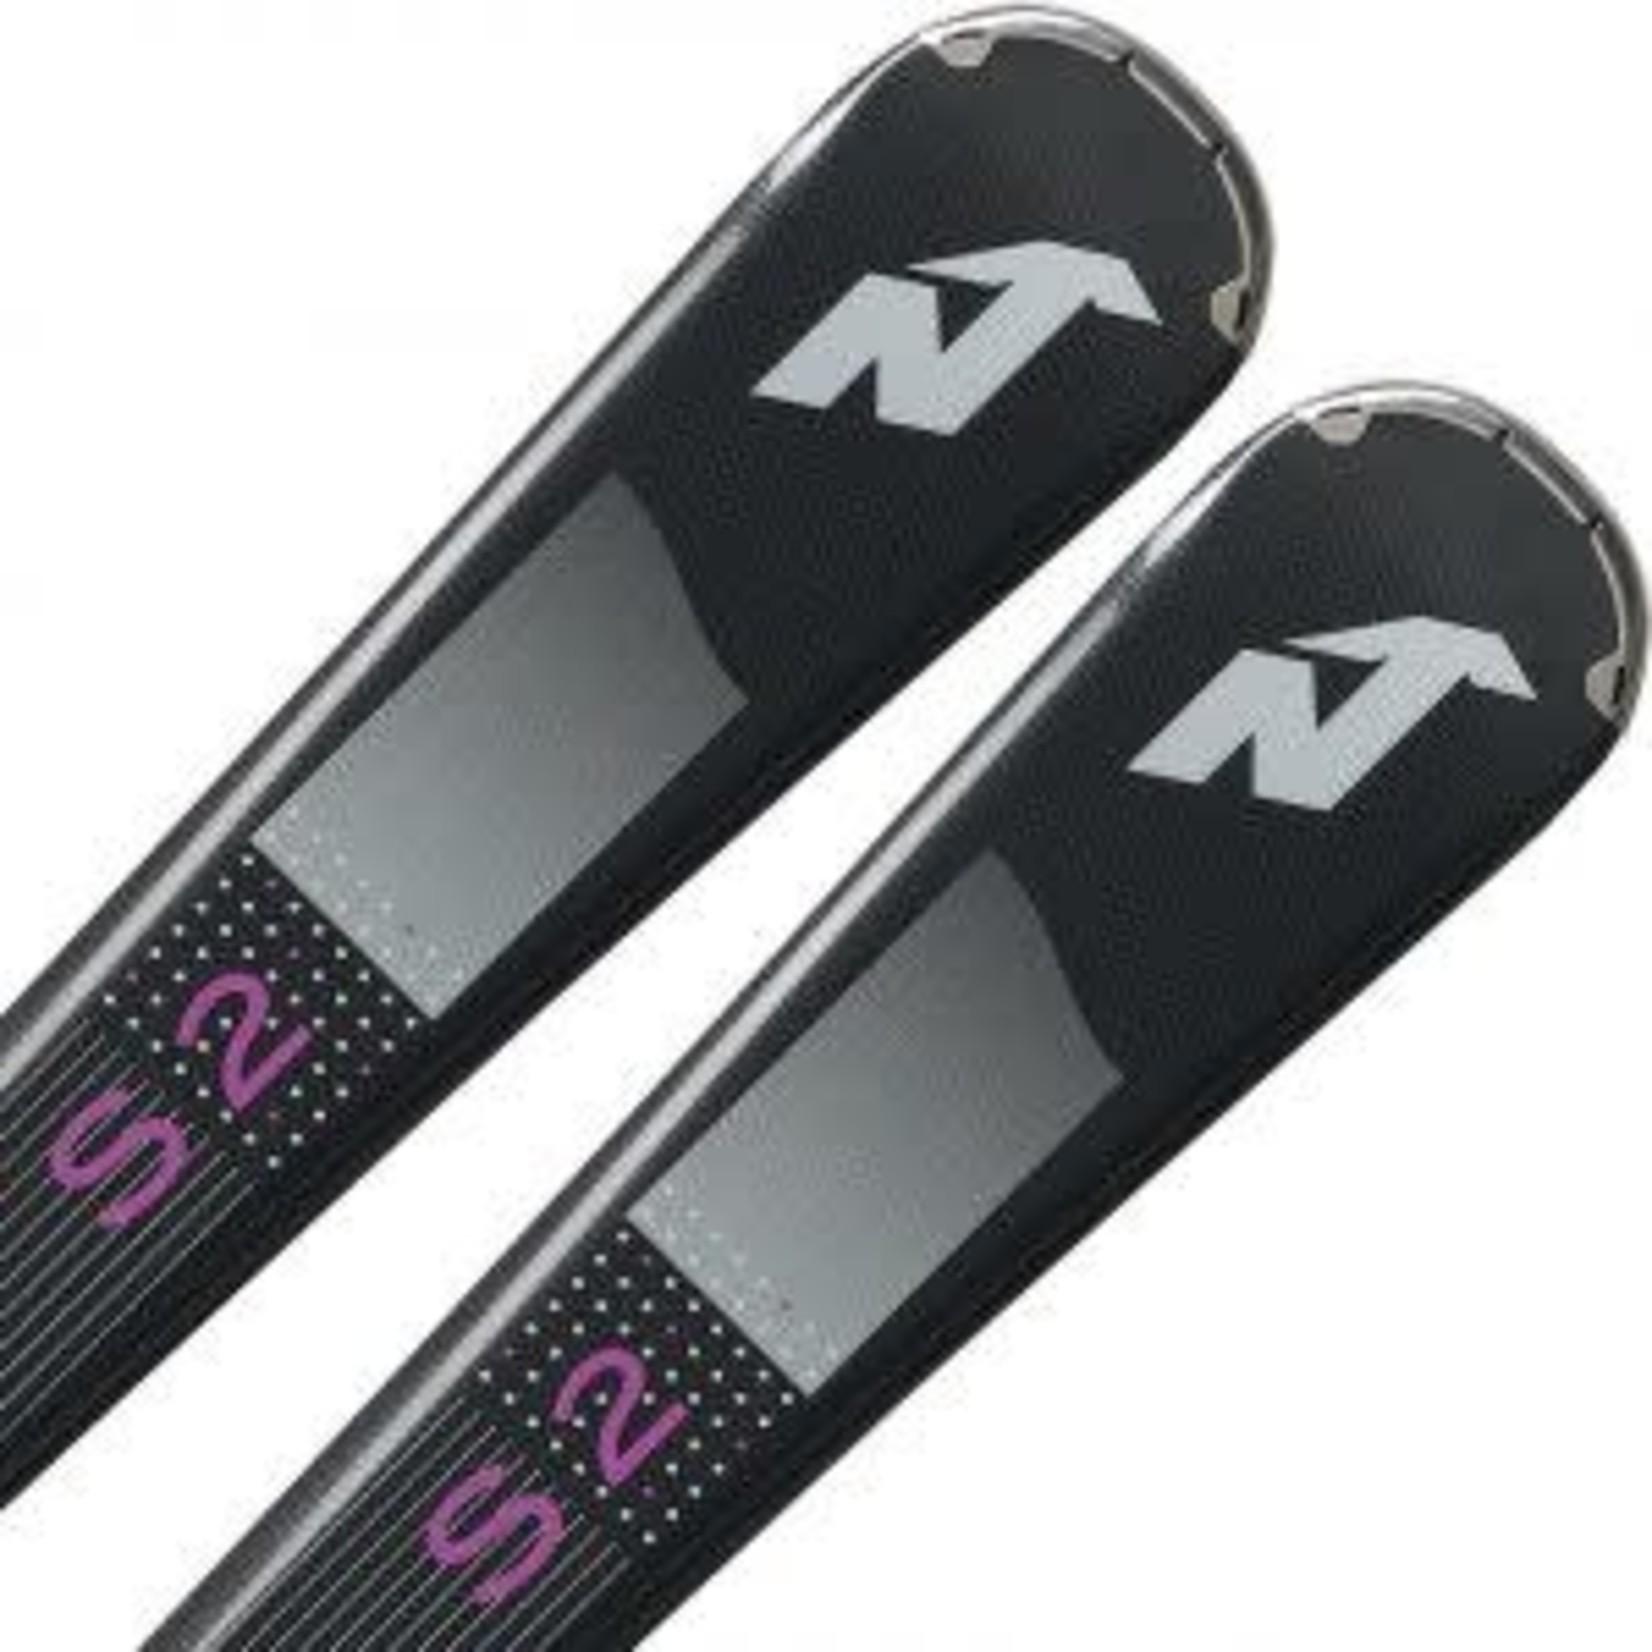 Nordica Ski Alpin Nordica Sentra S2 Noir/Argent